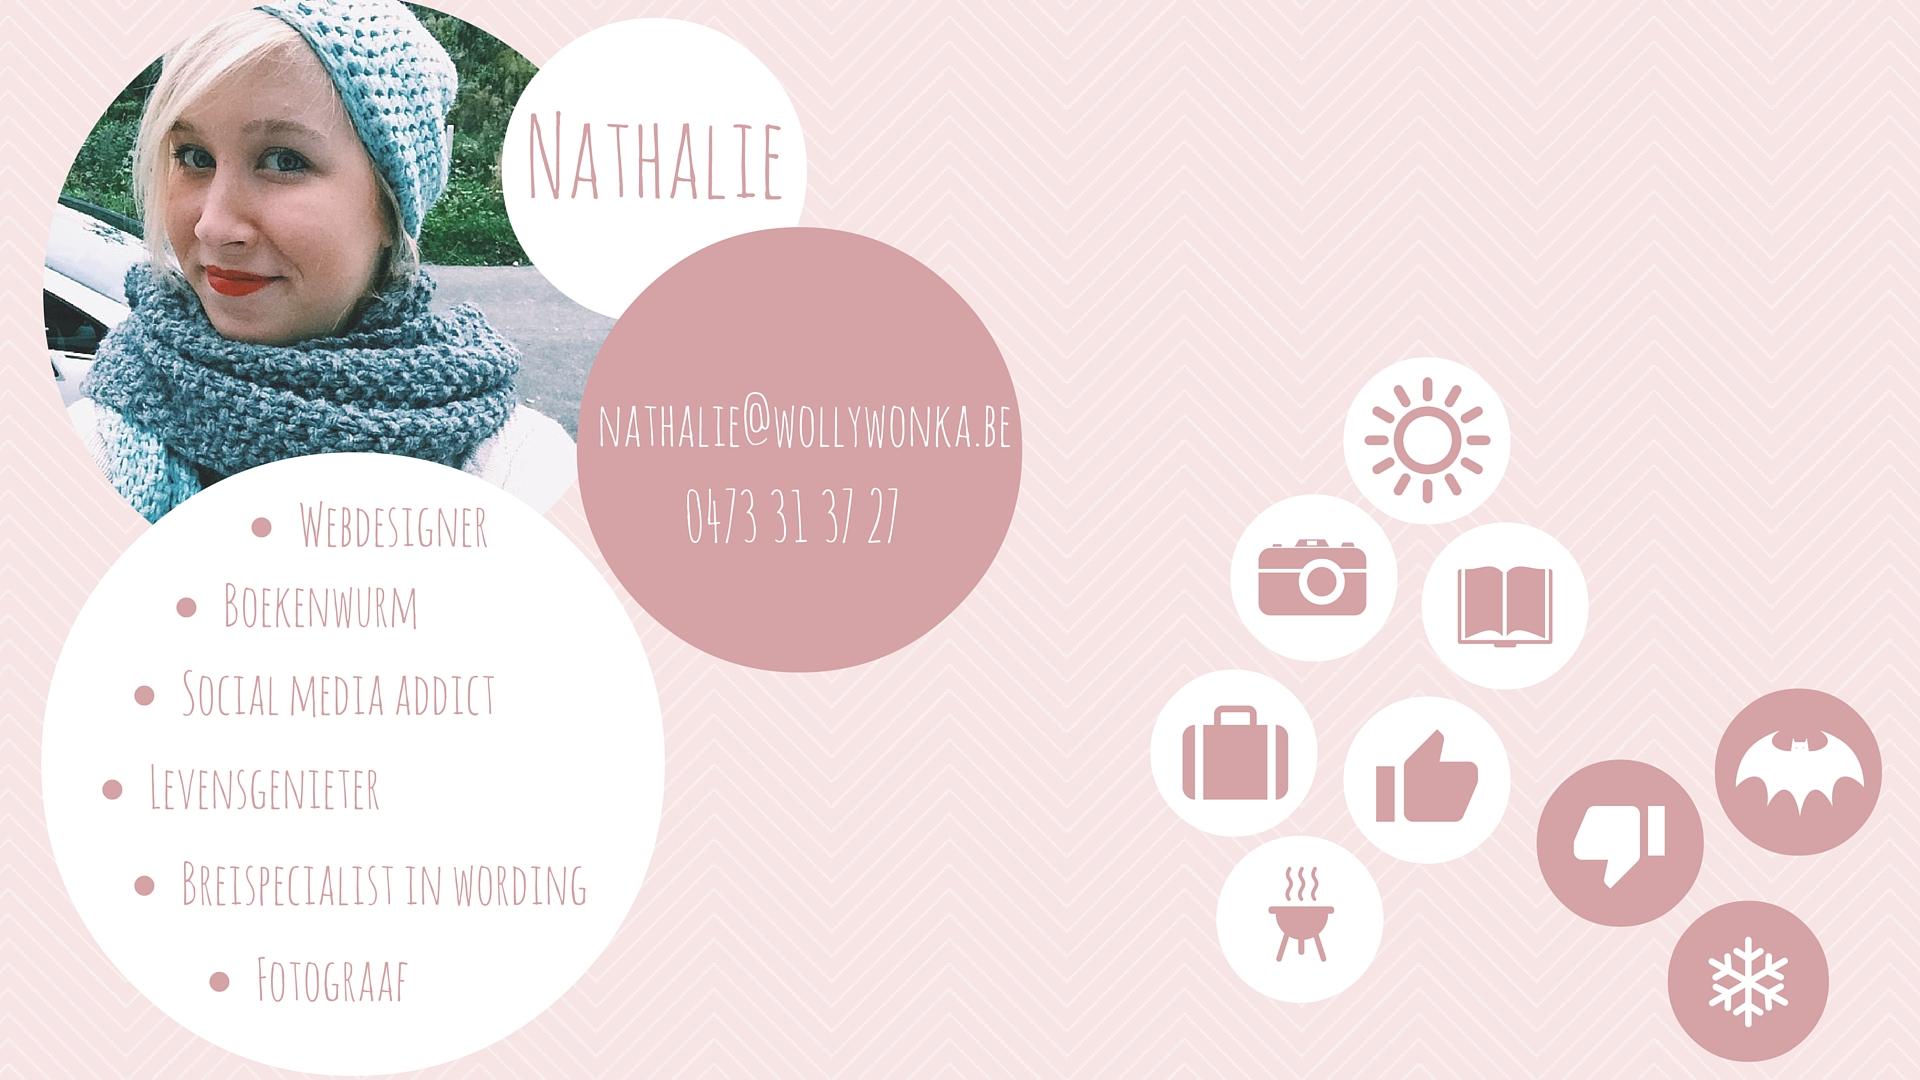 Nathalie (2)